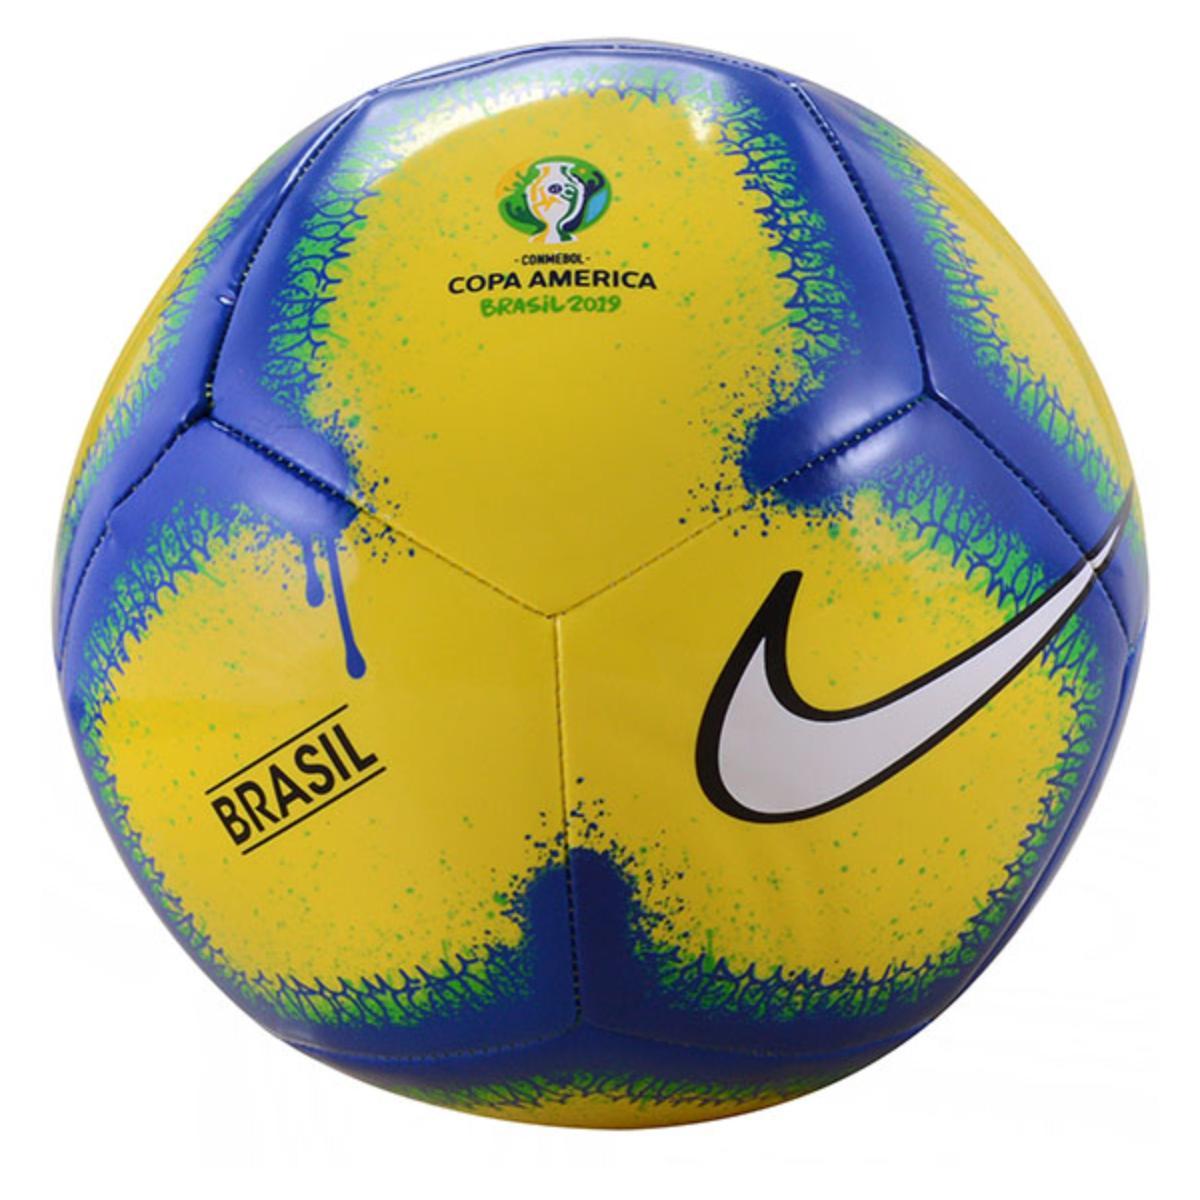 Bola Unisex Nike Sc3916-710 Copa America nk Amarelo/azul